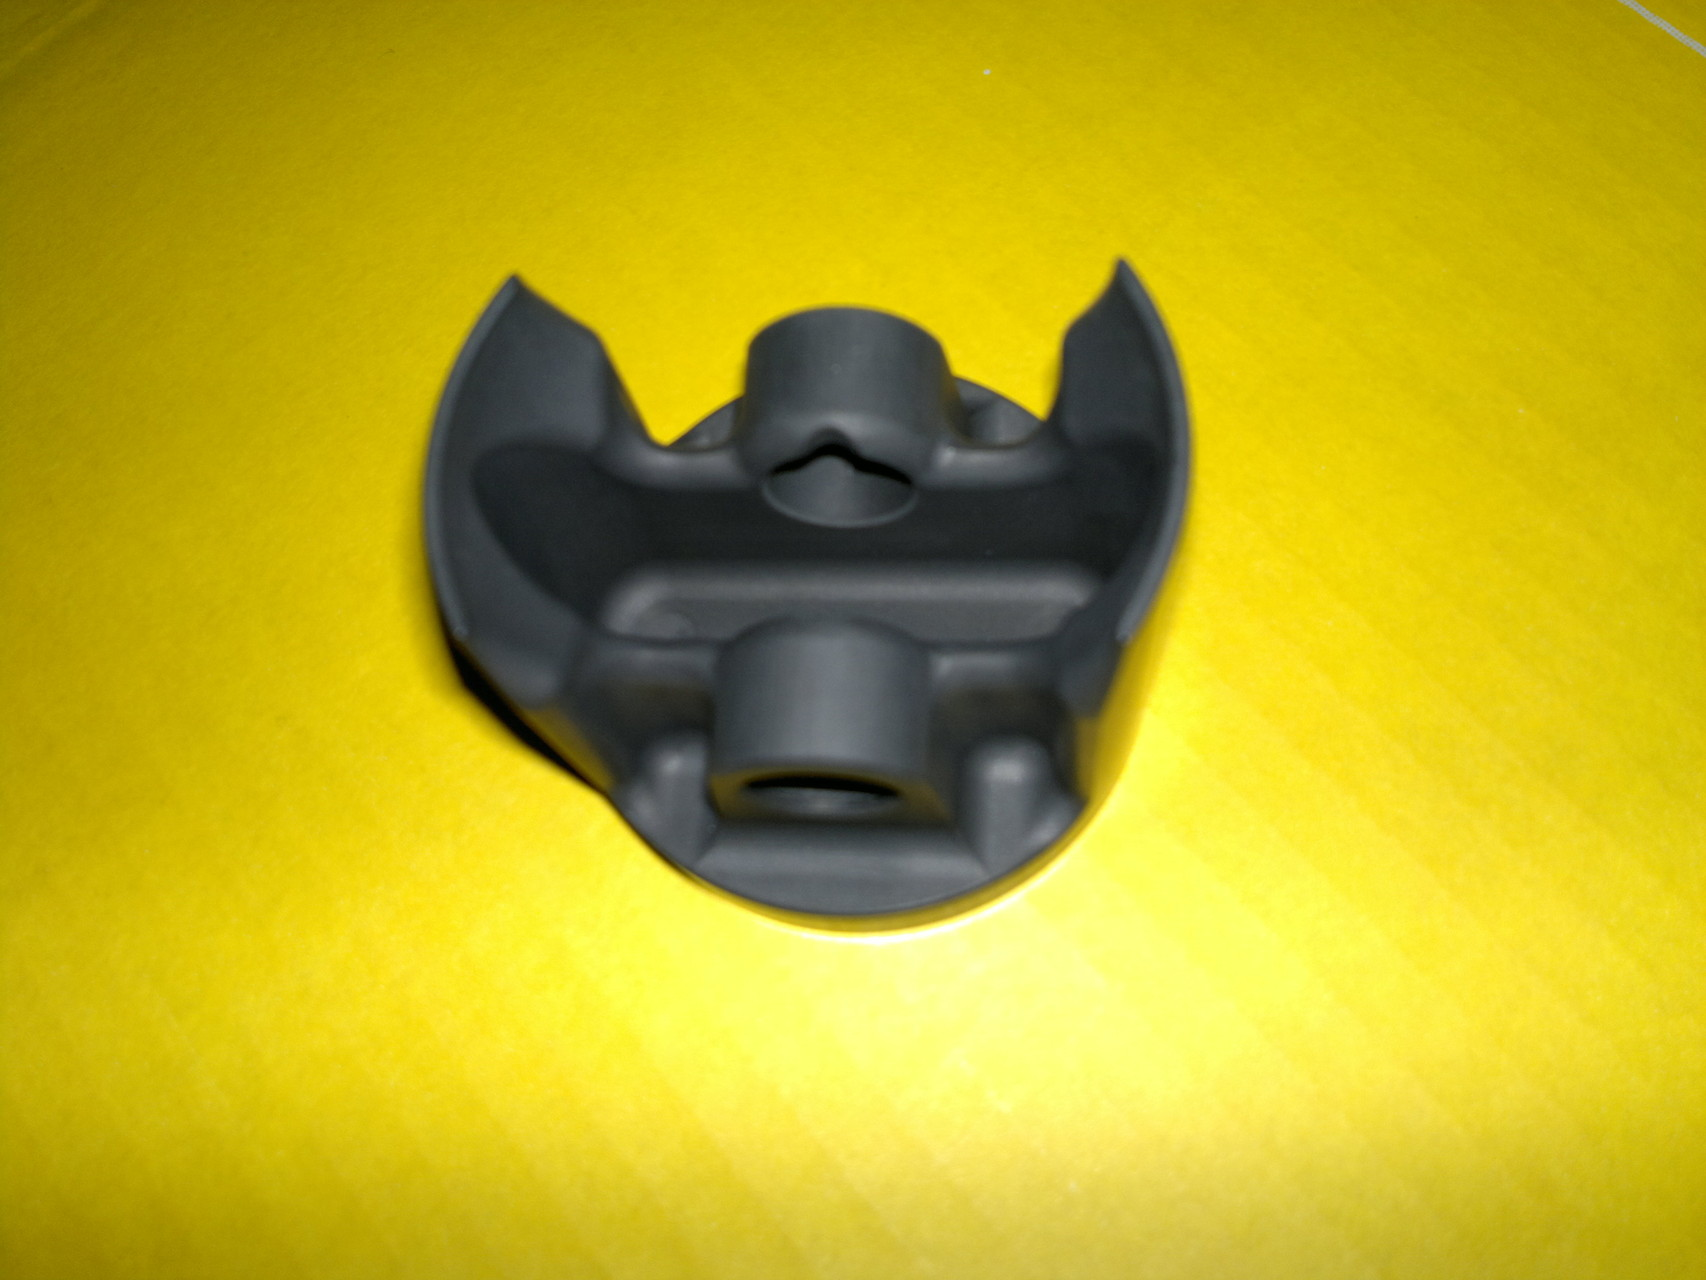 NR Ceramic Piston for Two-Stroke Engines